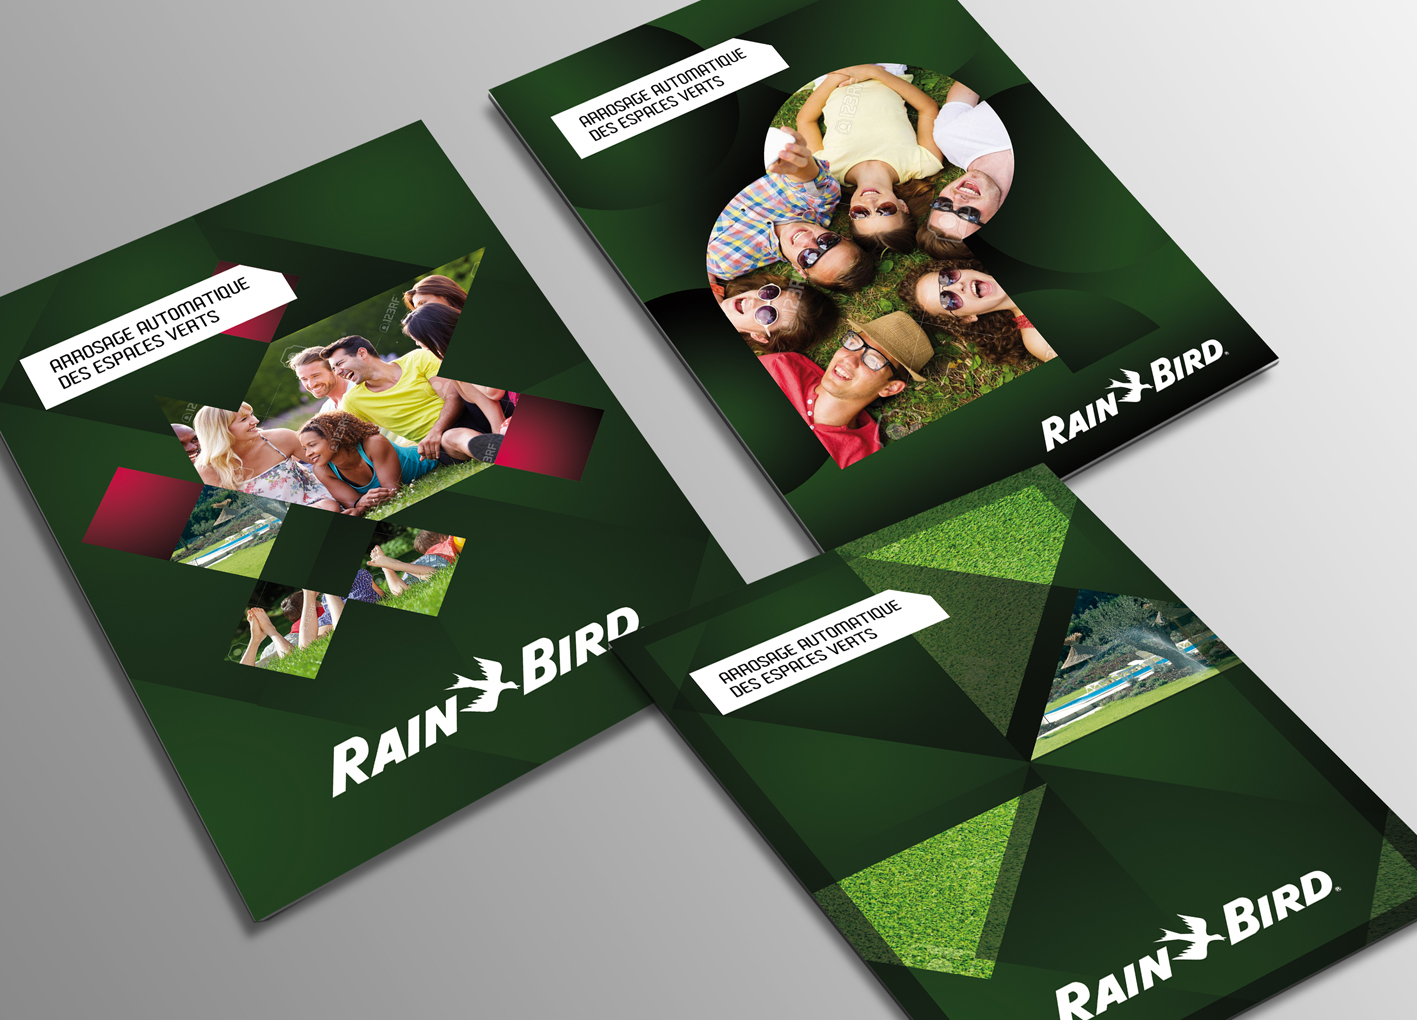 RAINBIRD couv cata 2020 - Rain Bird